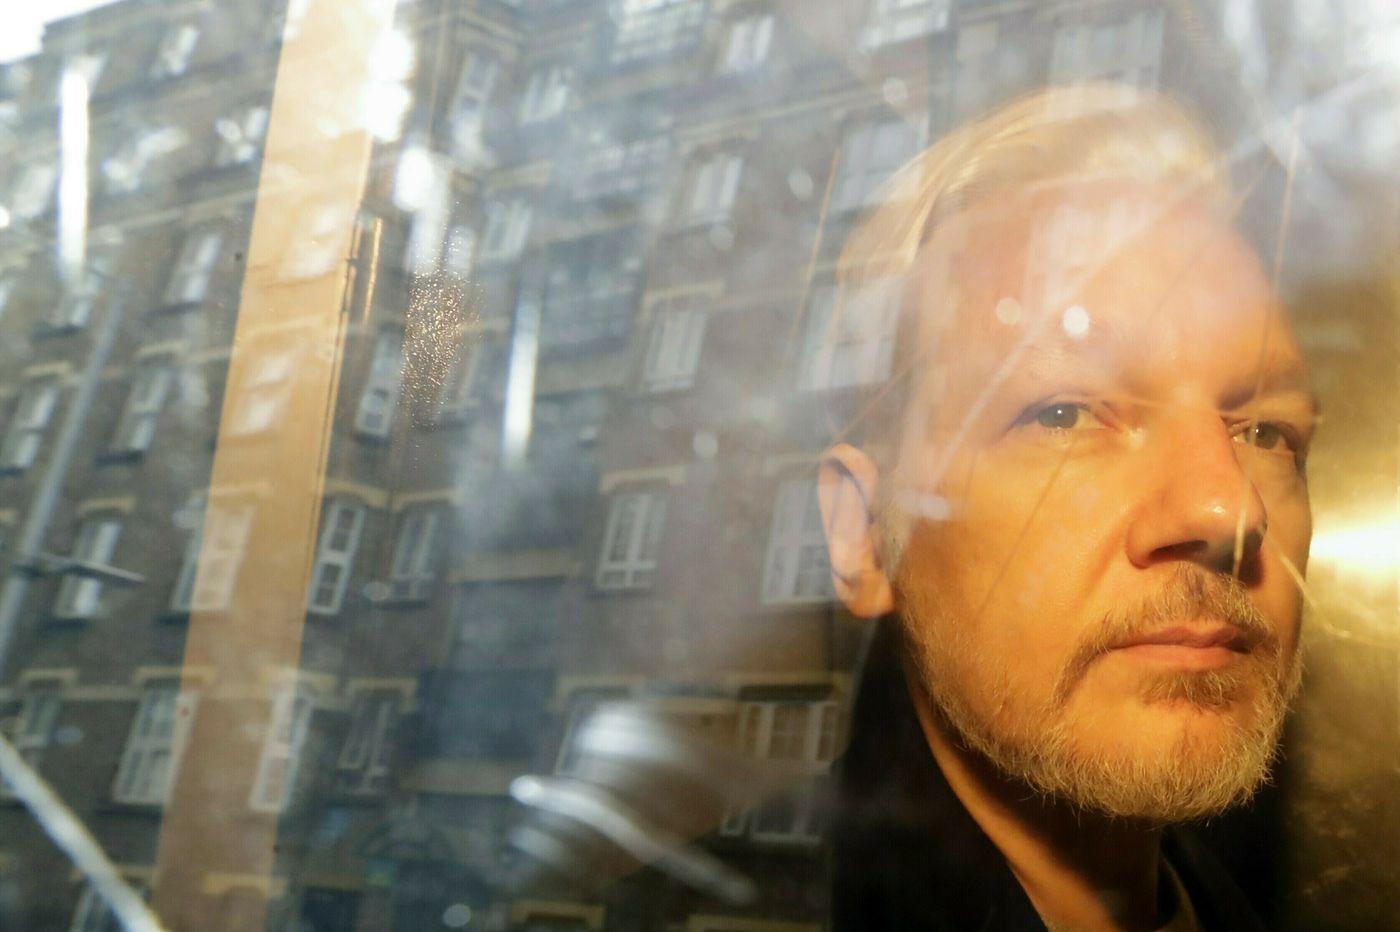 Julian Assange rape case to be reopened by Sweden